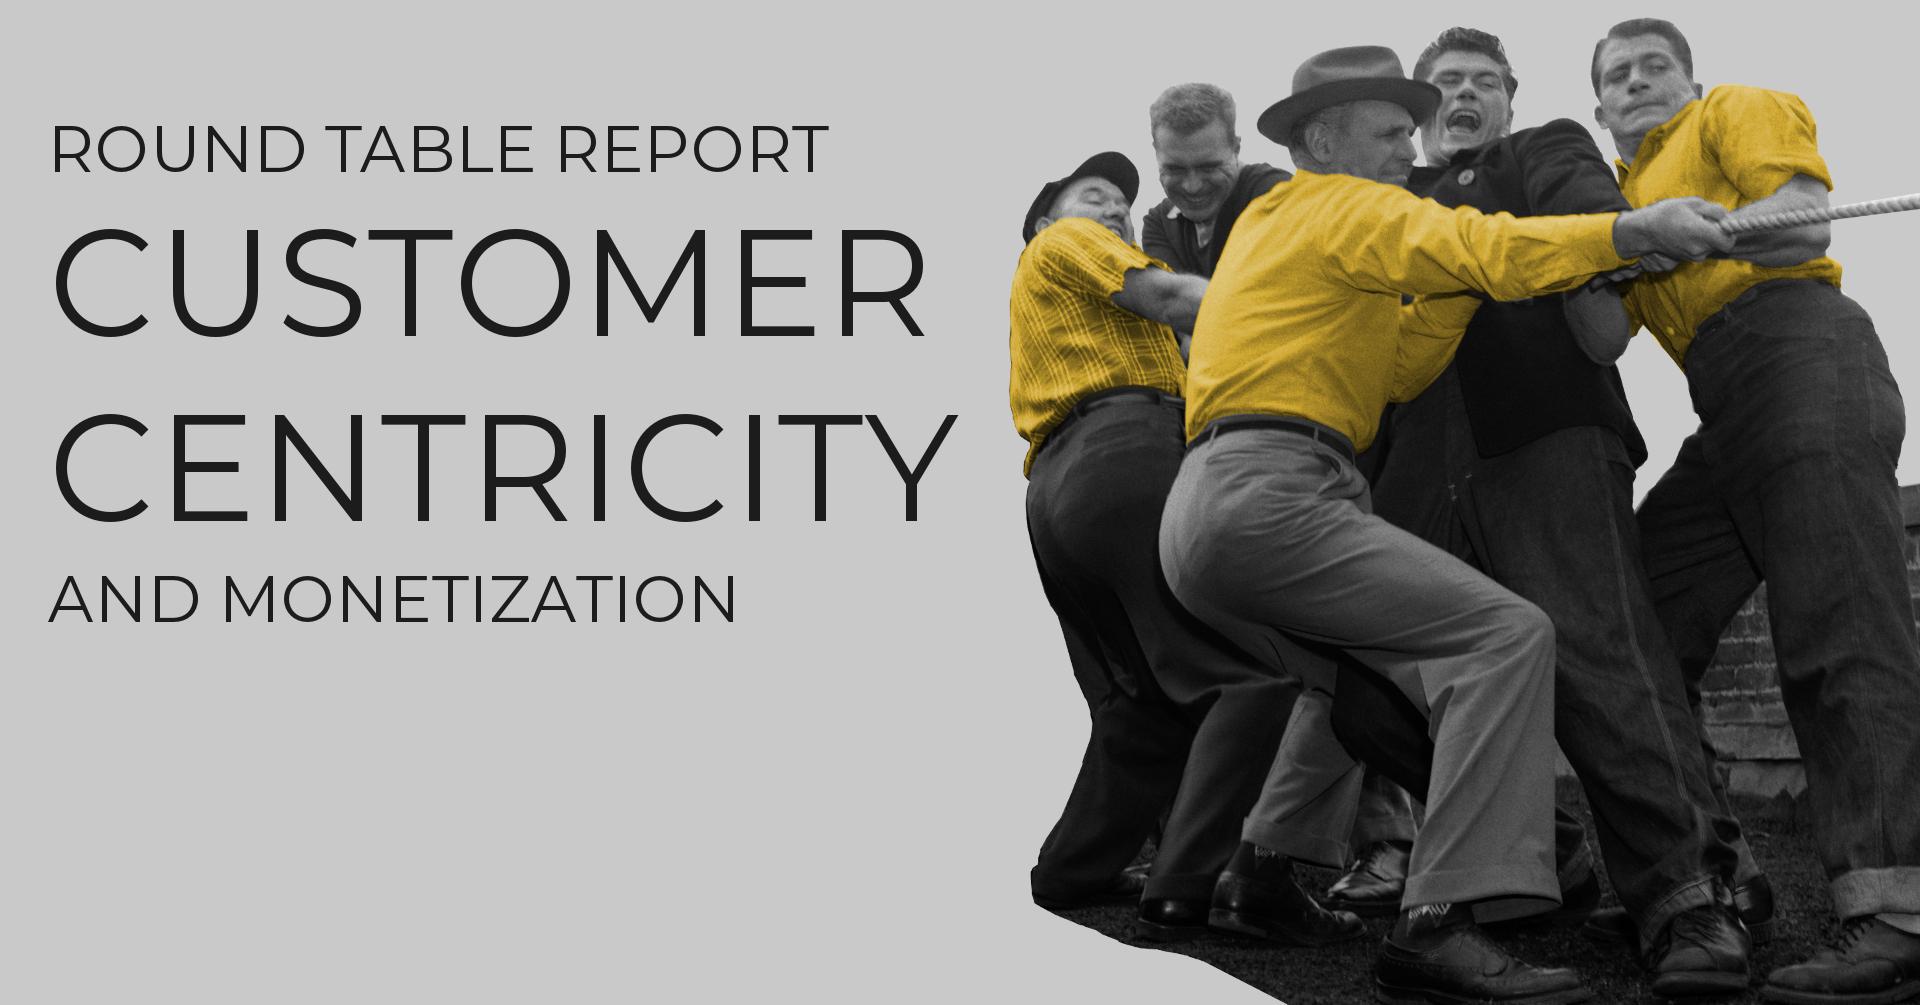 CustomerCentricity-1